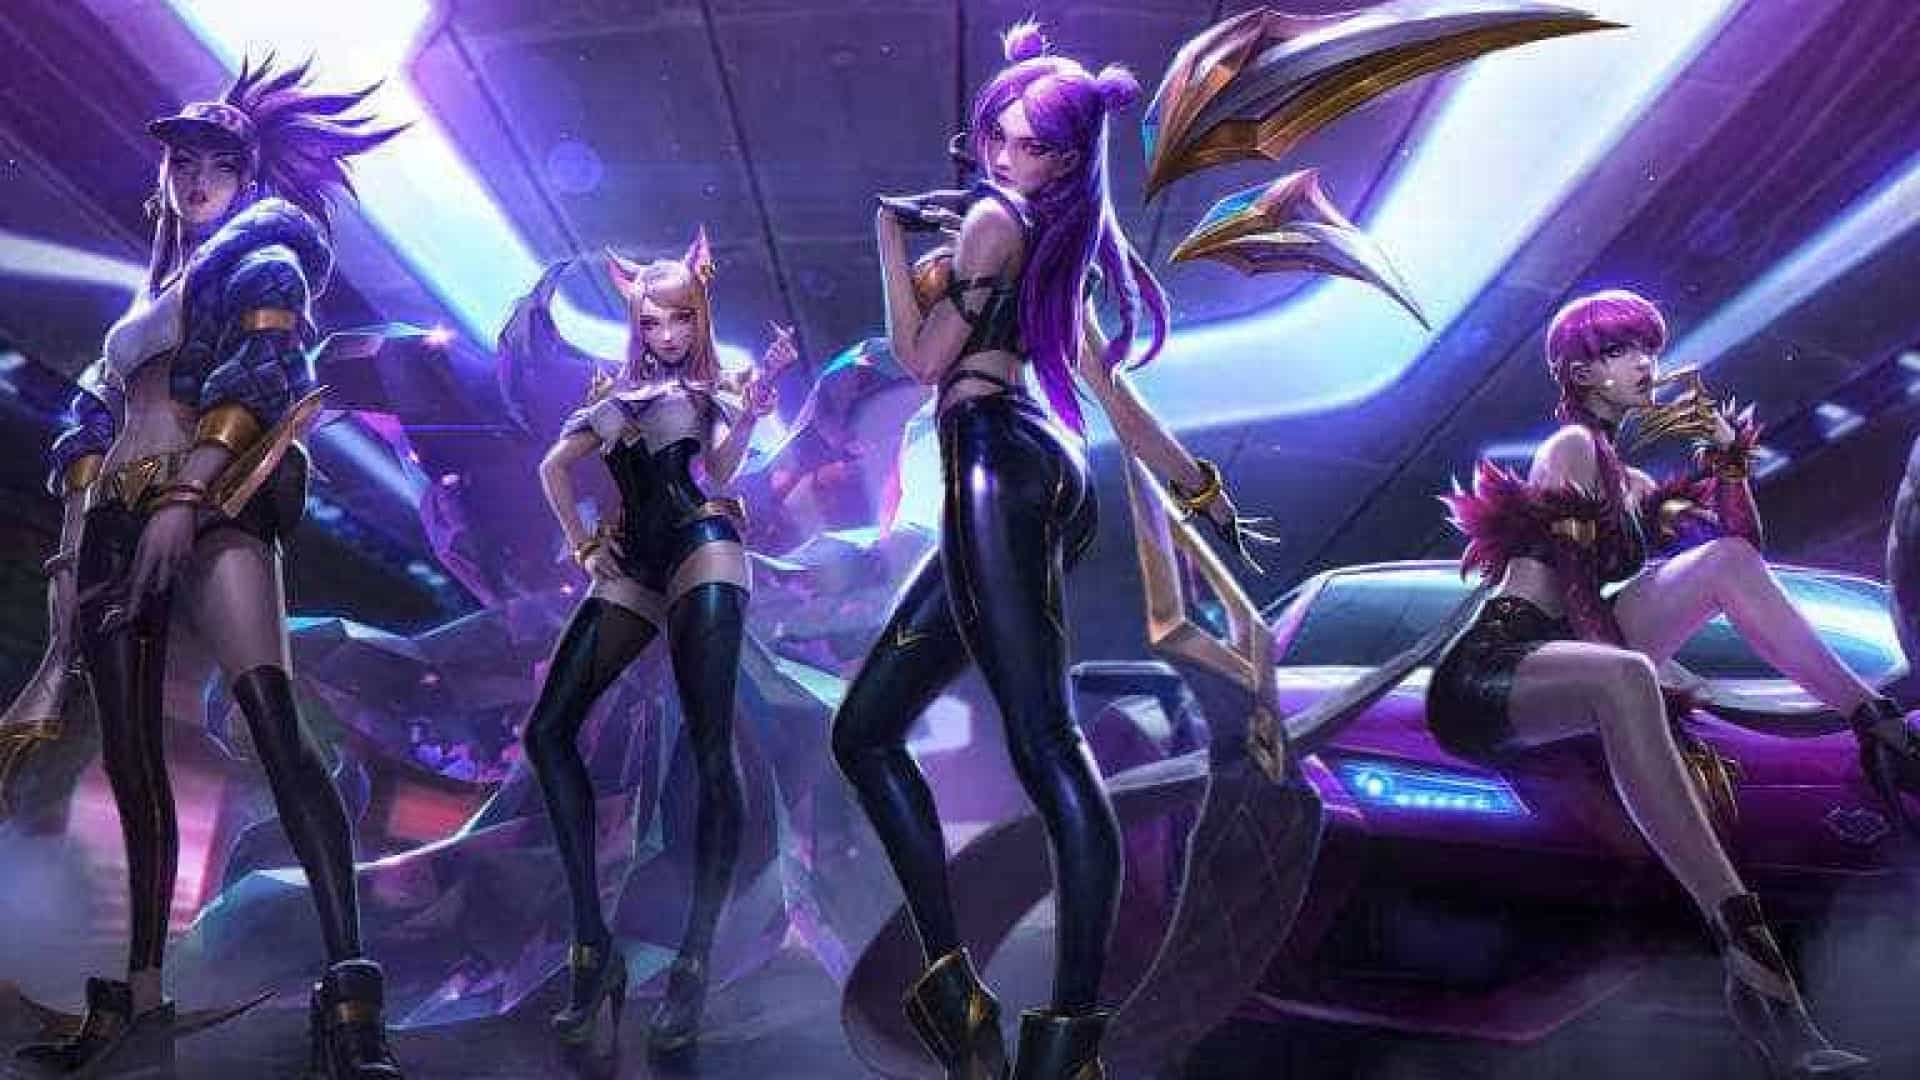 f1a5821c6ef4 Empresa de jogos cria banda feminina virtual inspirada no k-pop